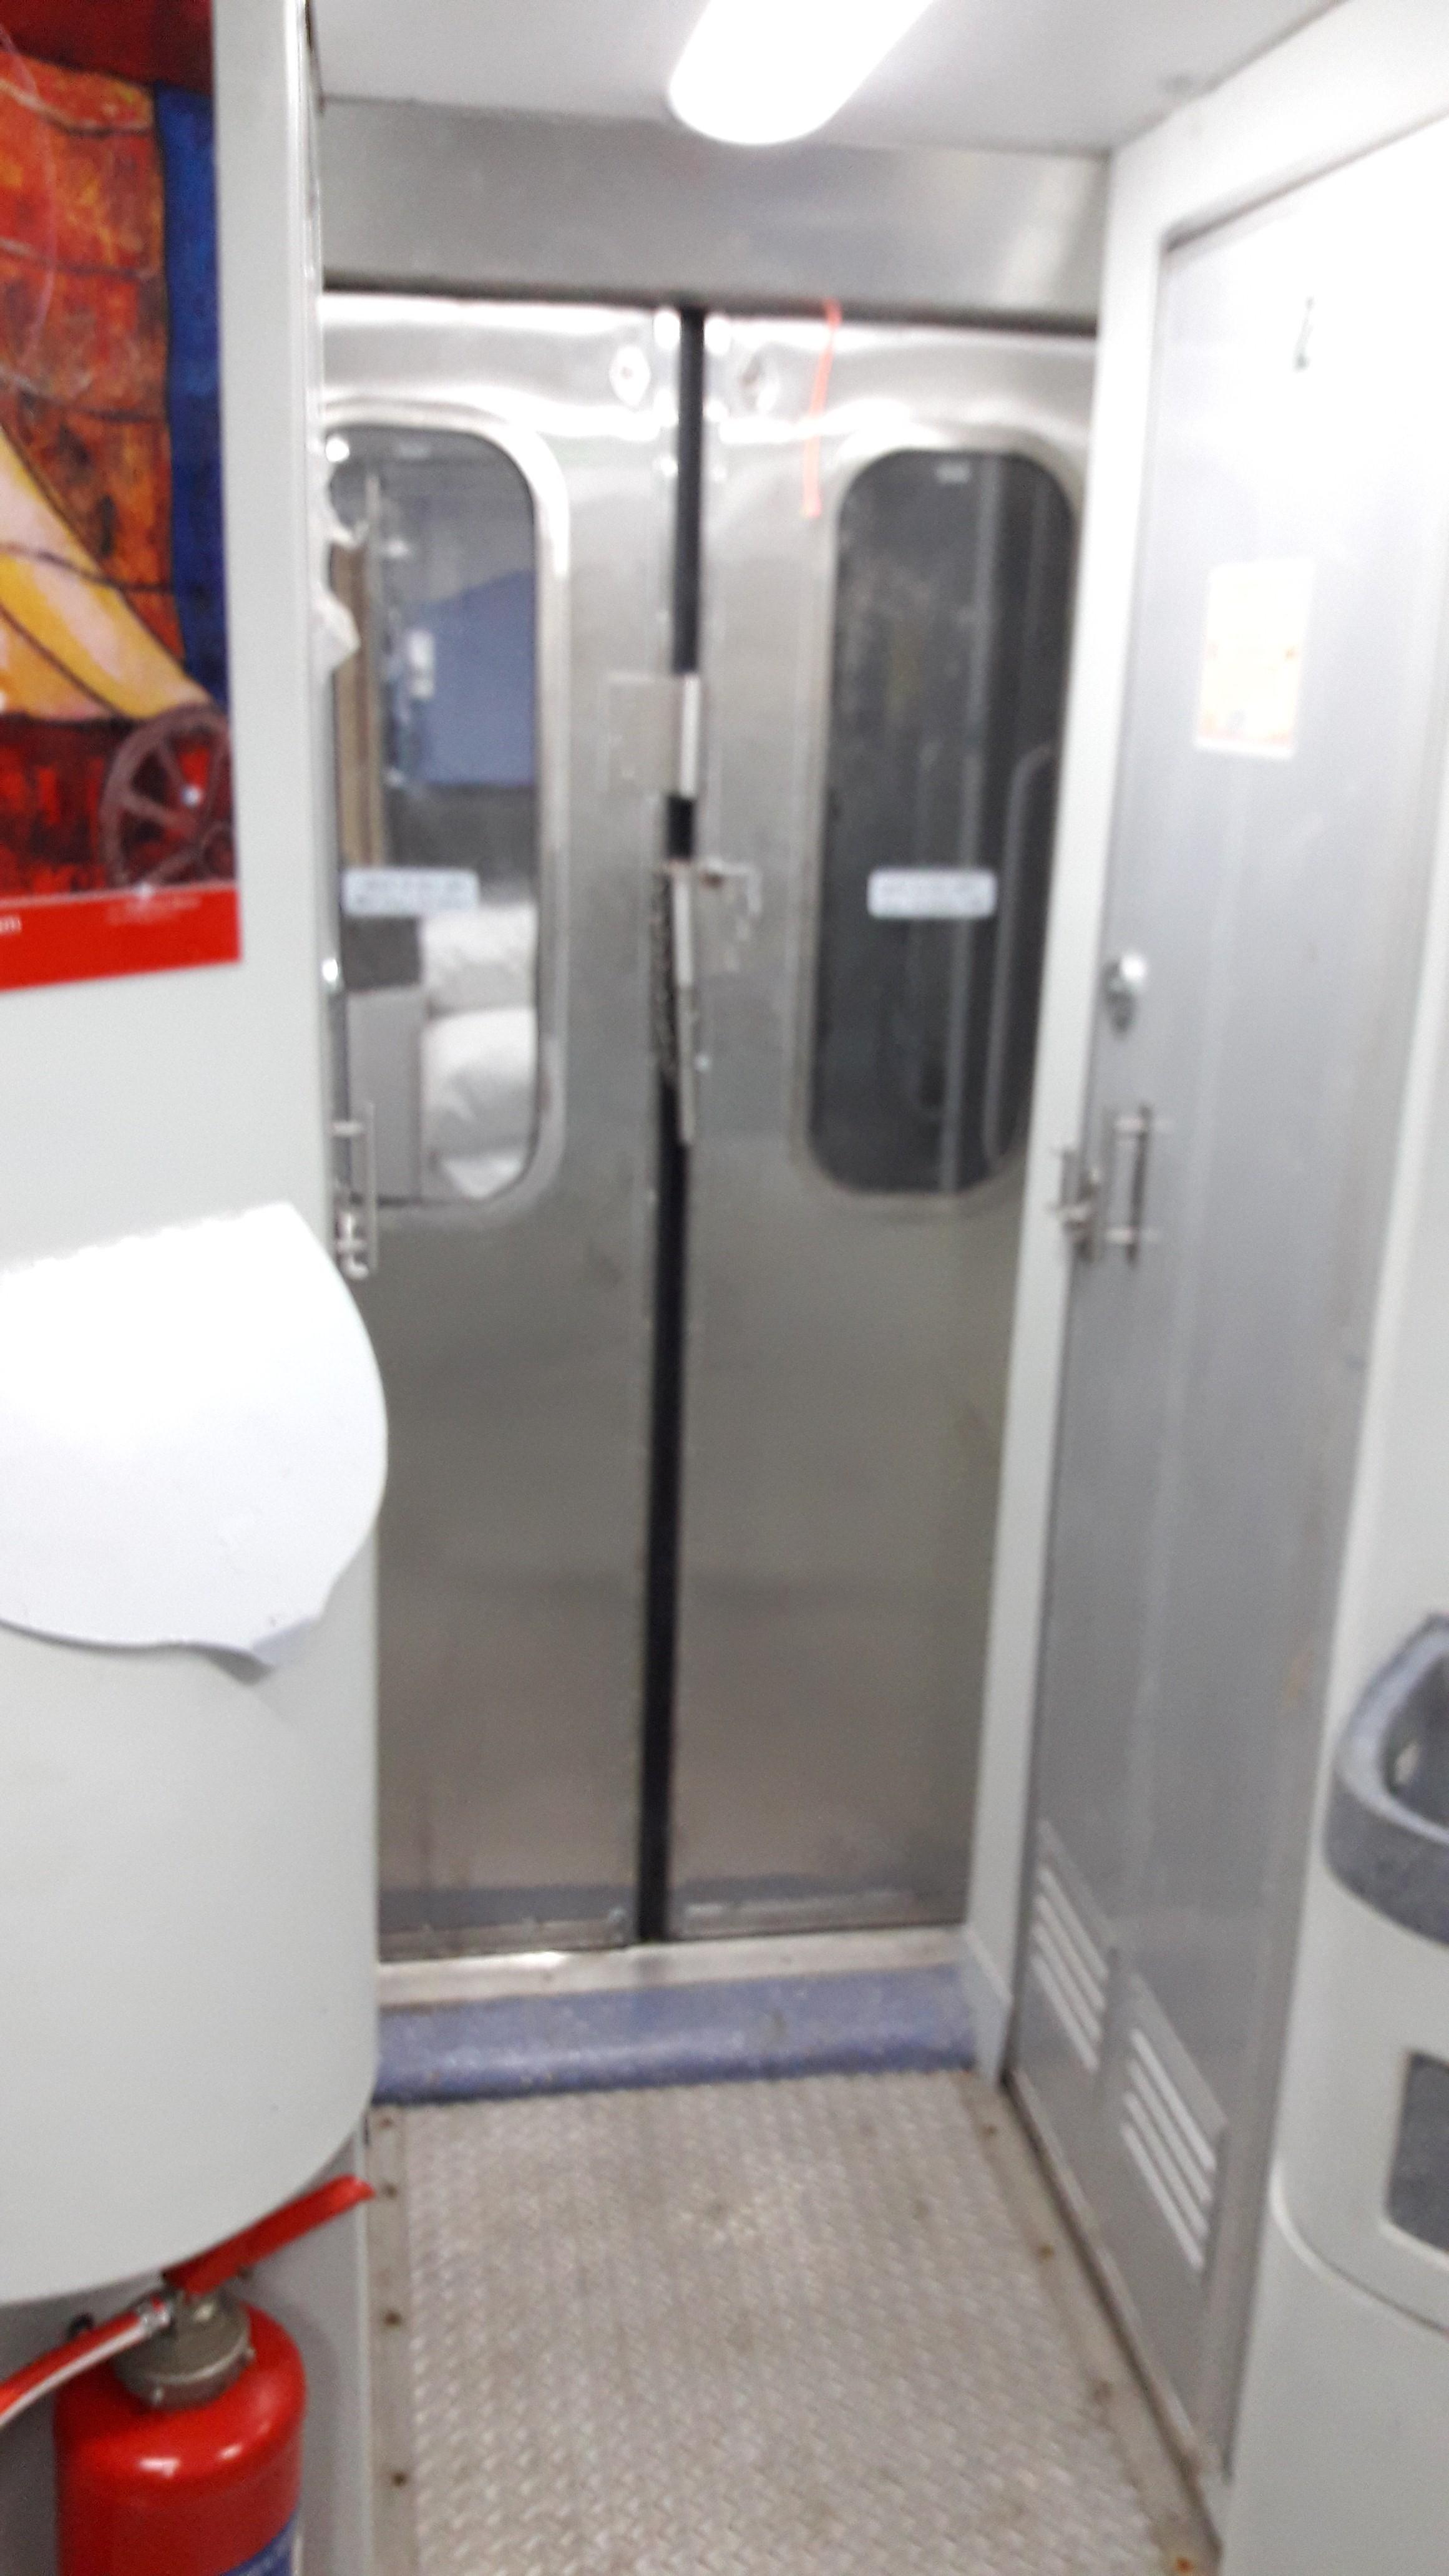 Rly_Toilet_Corridor_2___20190416021316___.jpg